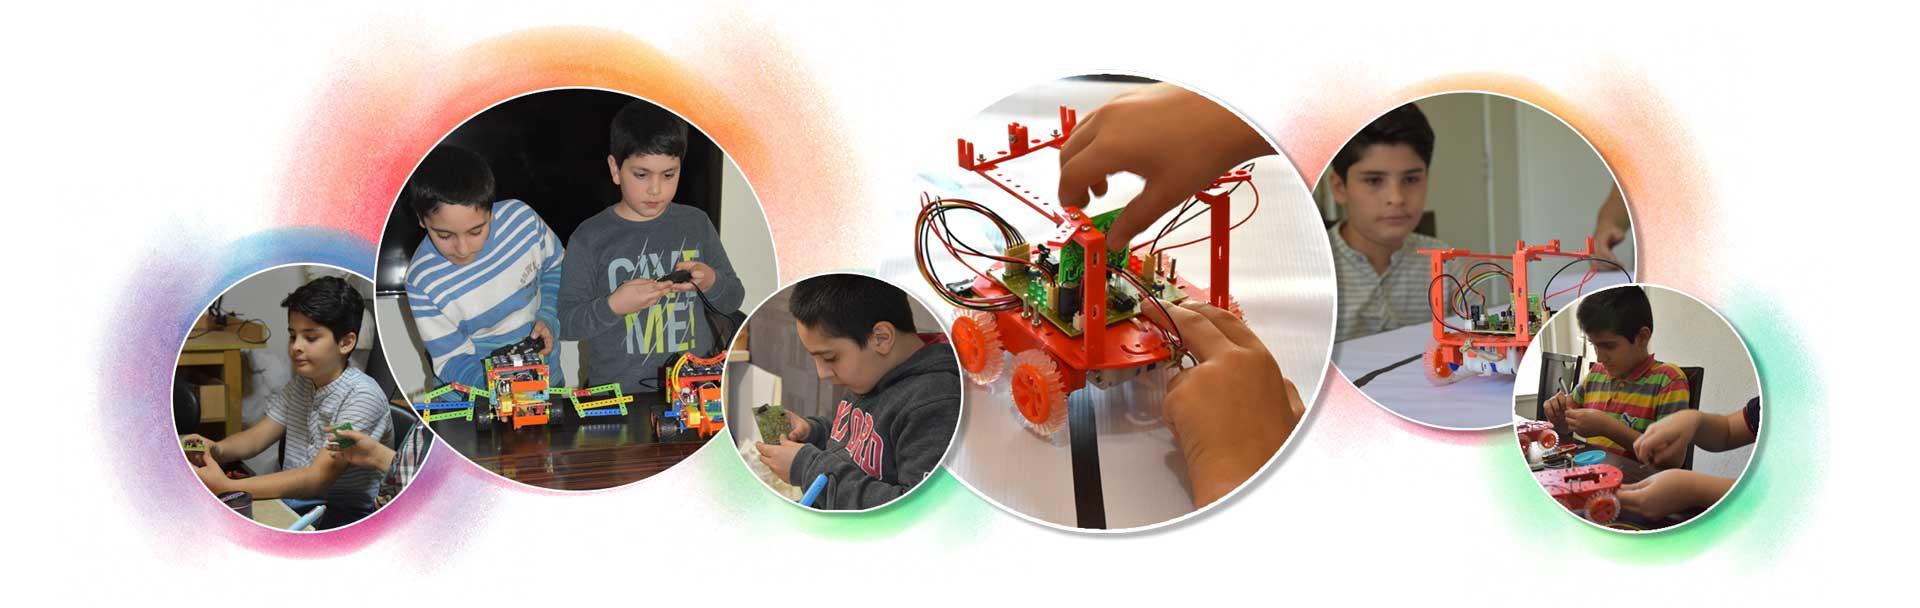 robatic 7 - آموزش رباتیک نوجوانان